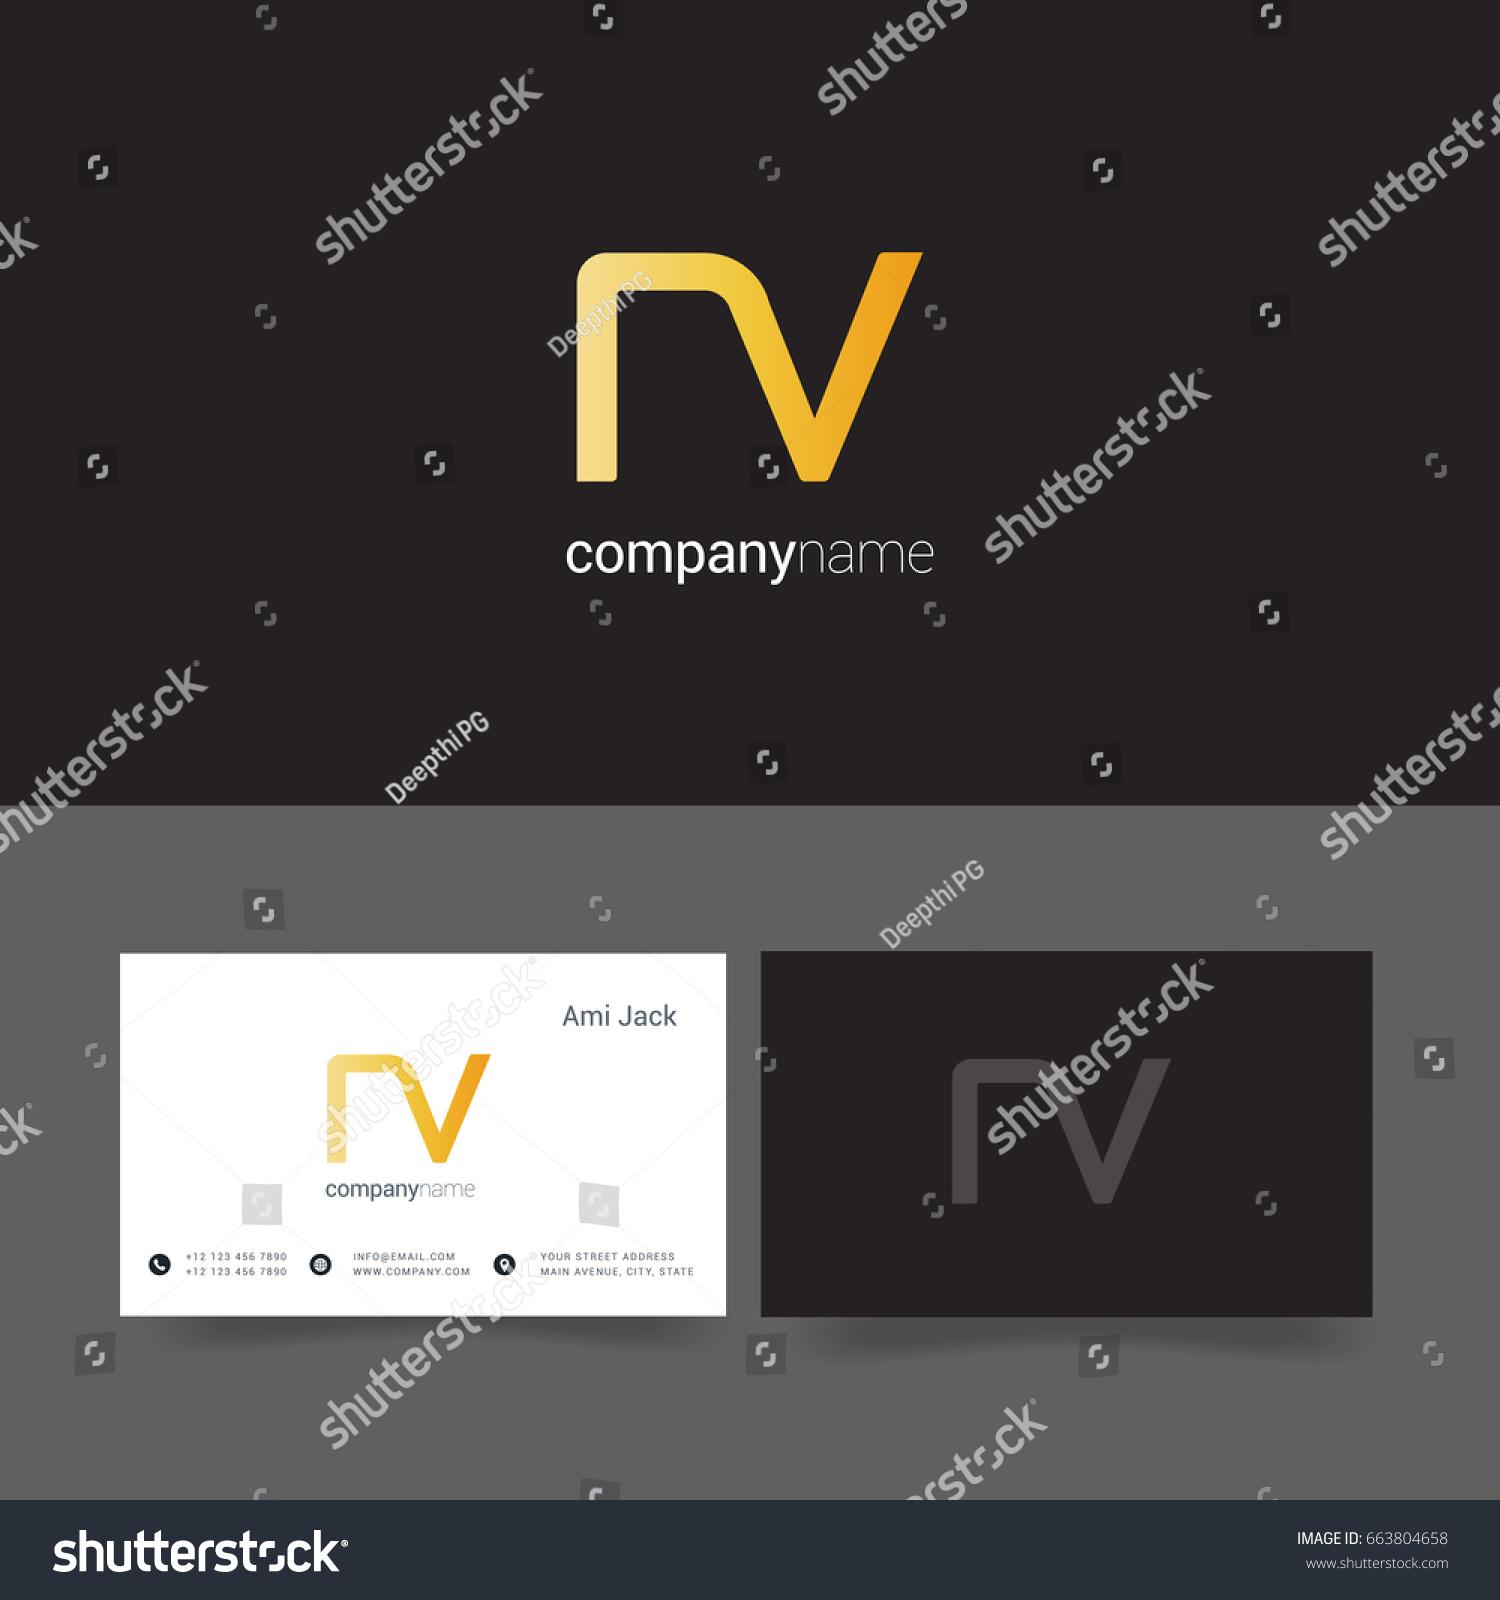 N v joint logo letter design stock vector hd royalty free n v joint logo letter design with business card template altavistaventures Gallery